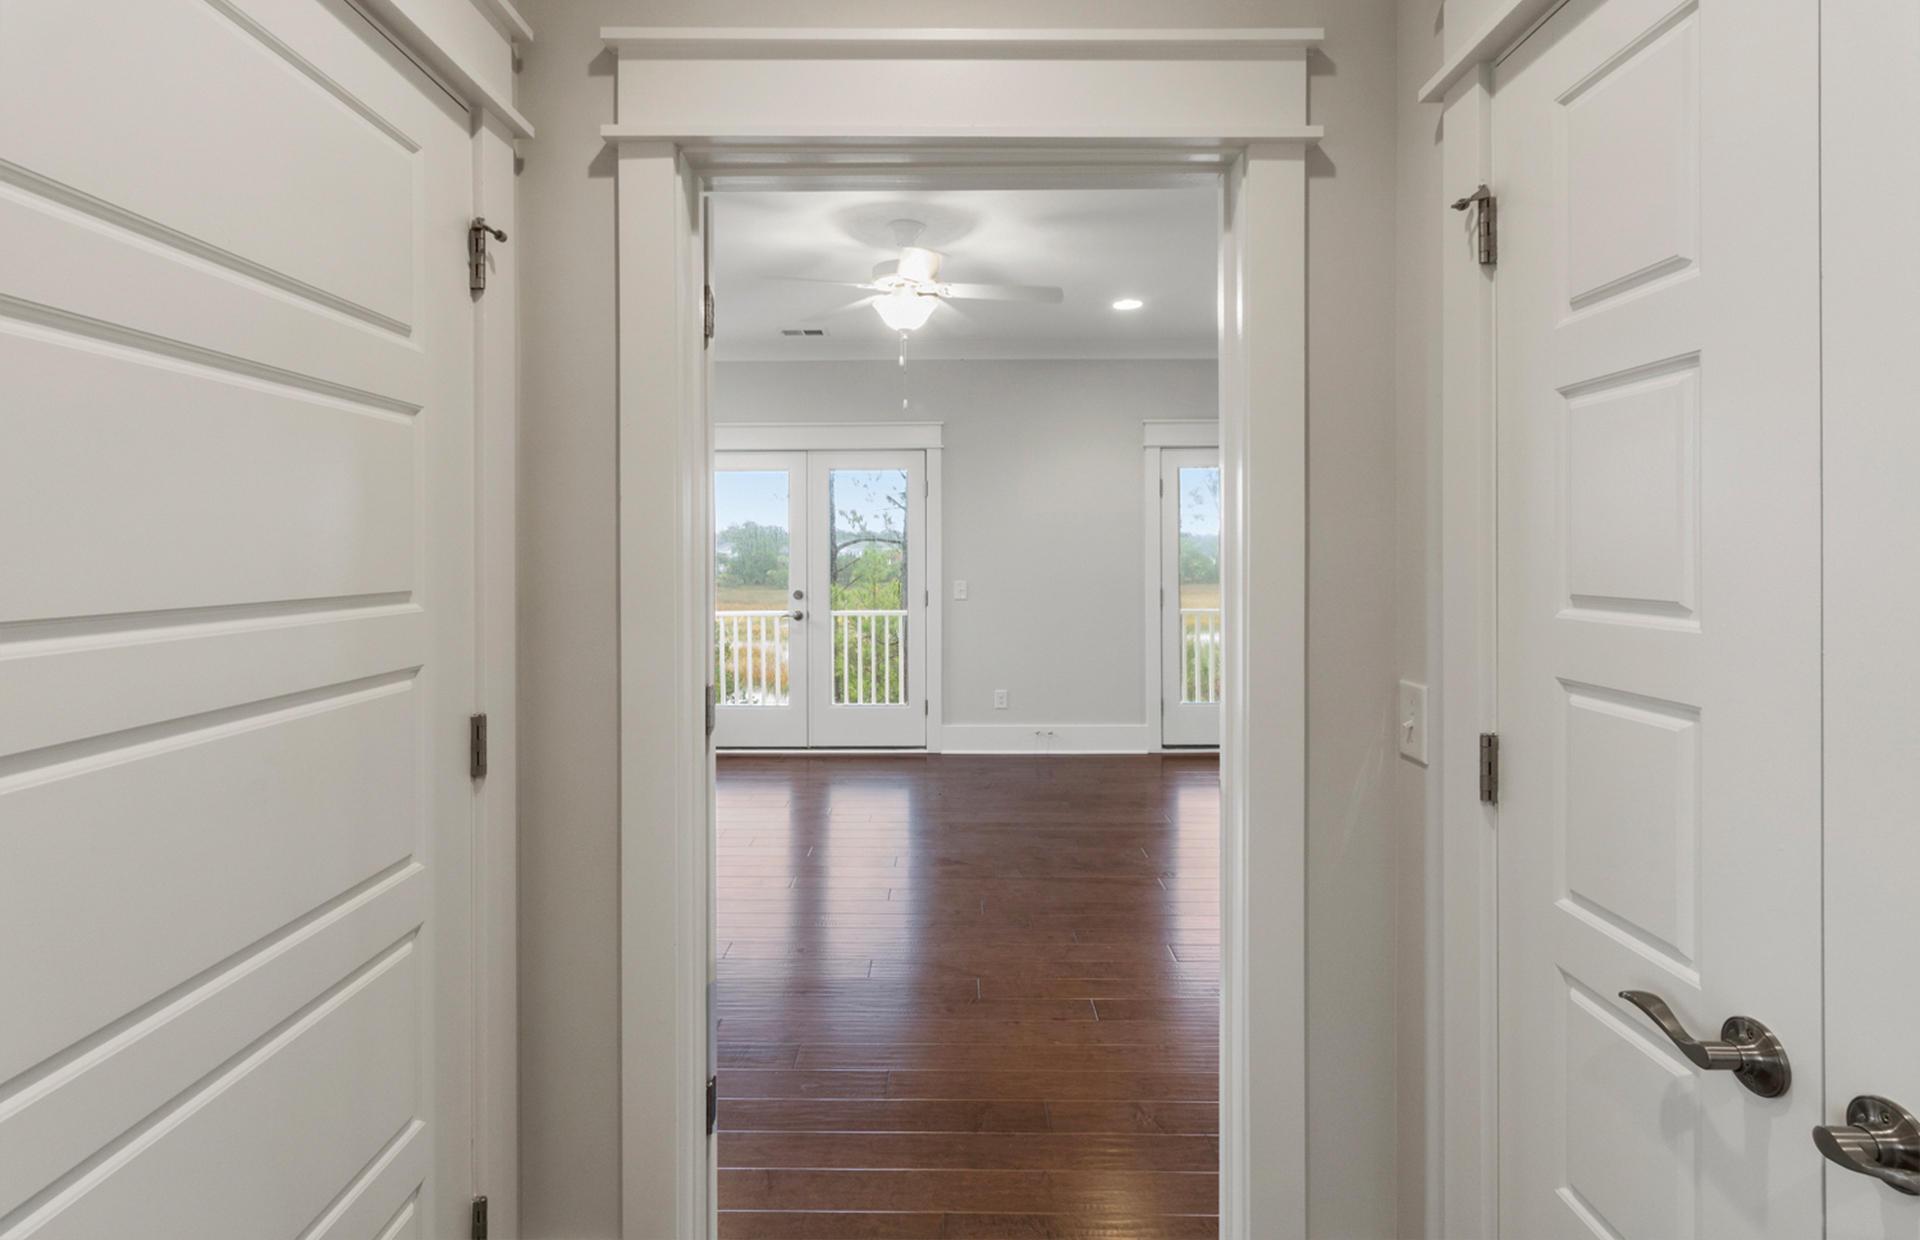 Dunes West Homes For Sale - 2324 Bucktail Court, Mount Pleasant, SC - 7